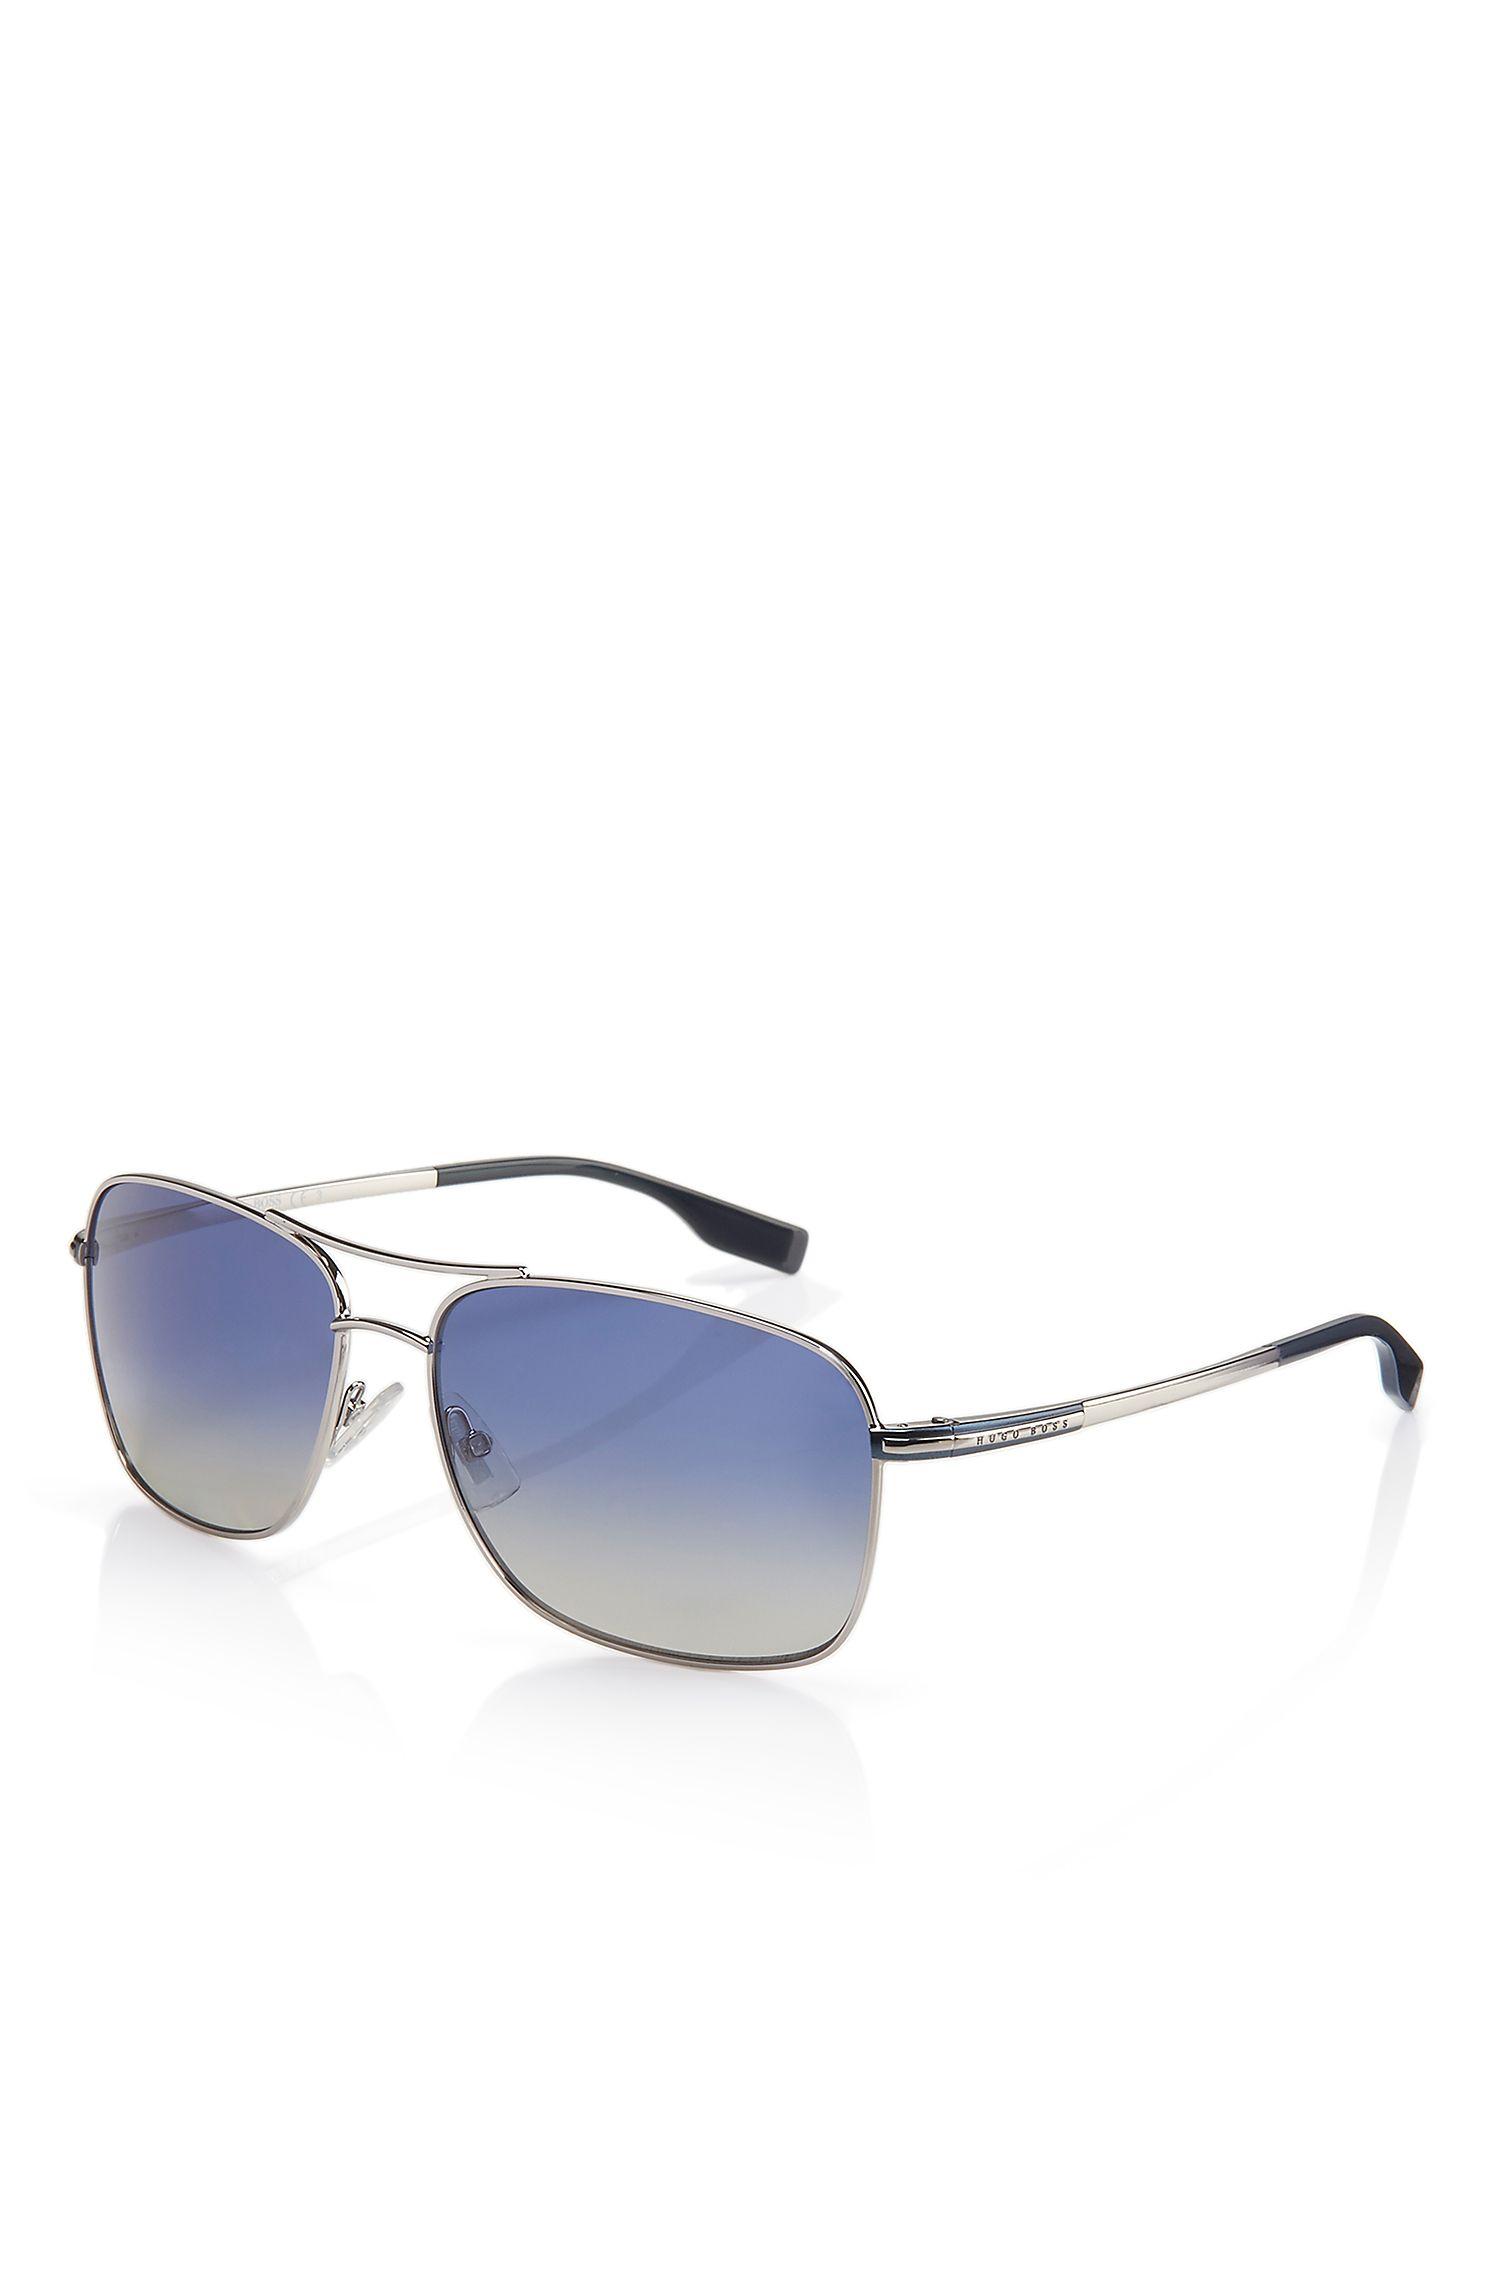 'BOSS 058PS'   Double Bridge Navigator Gradient Lens Sunglasses